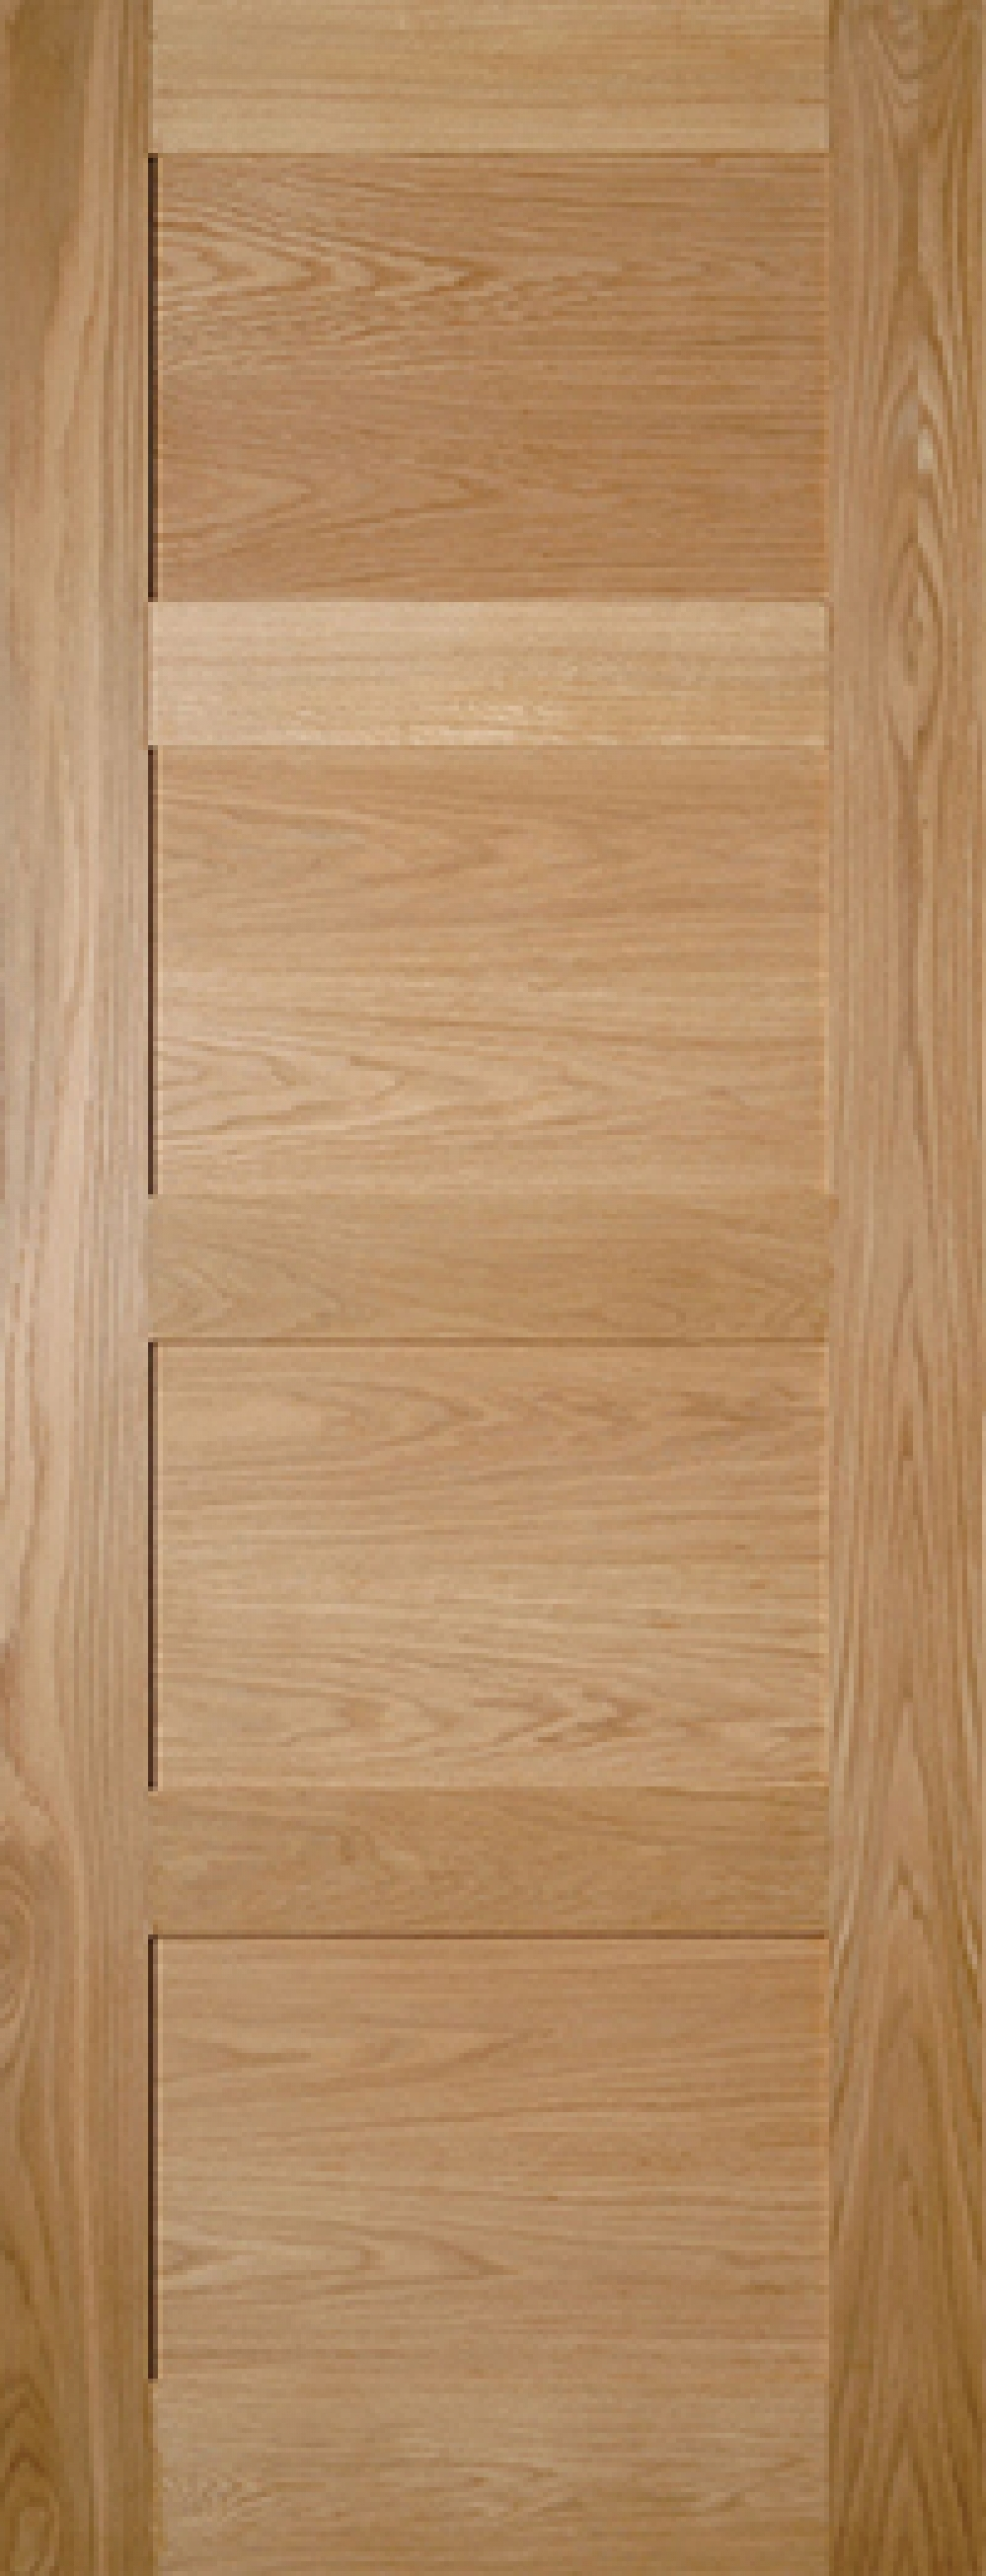 Coventry Prefinished Shaker 4 Panel Oak Door